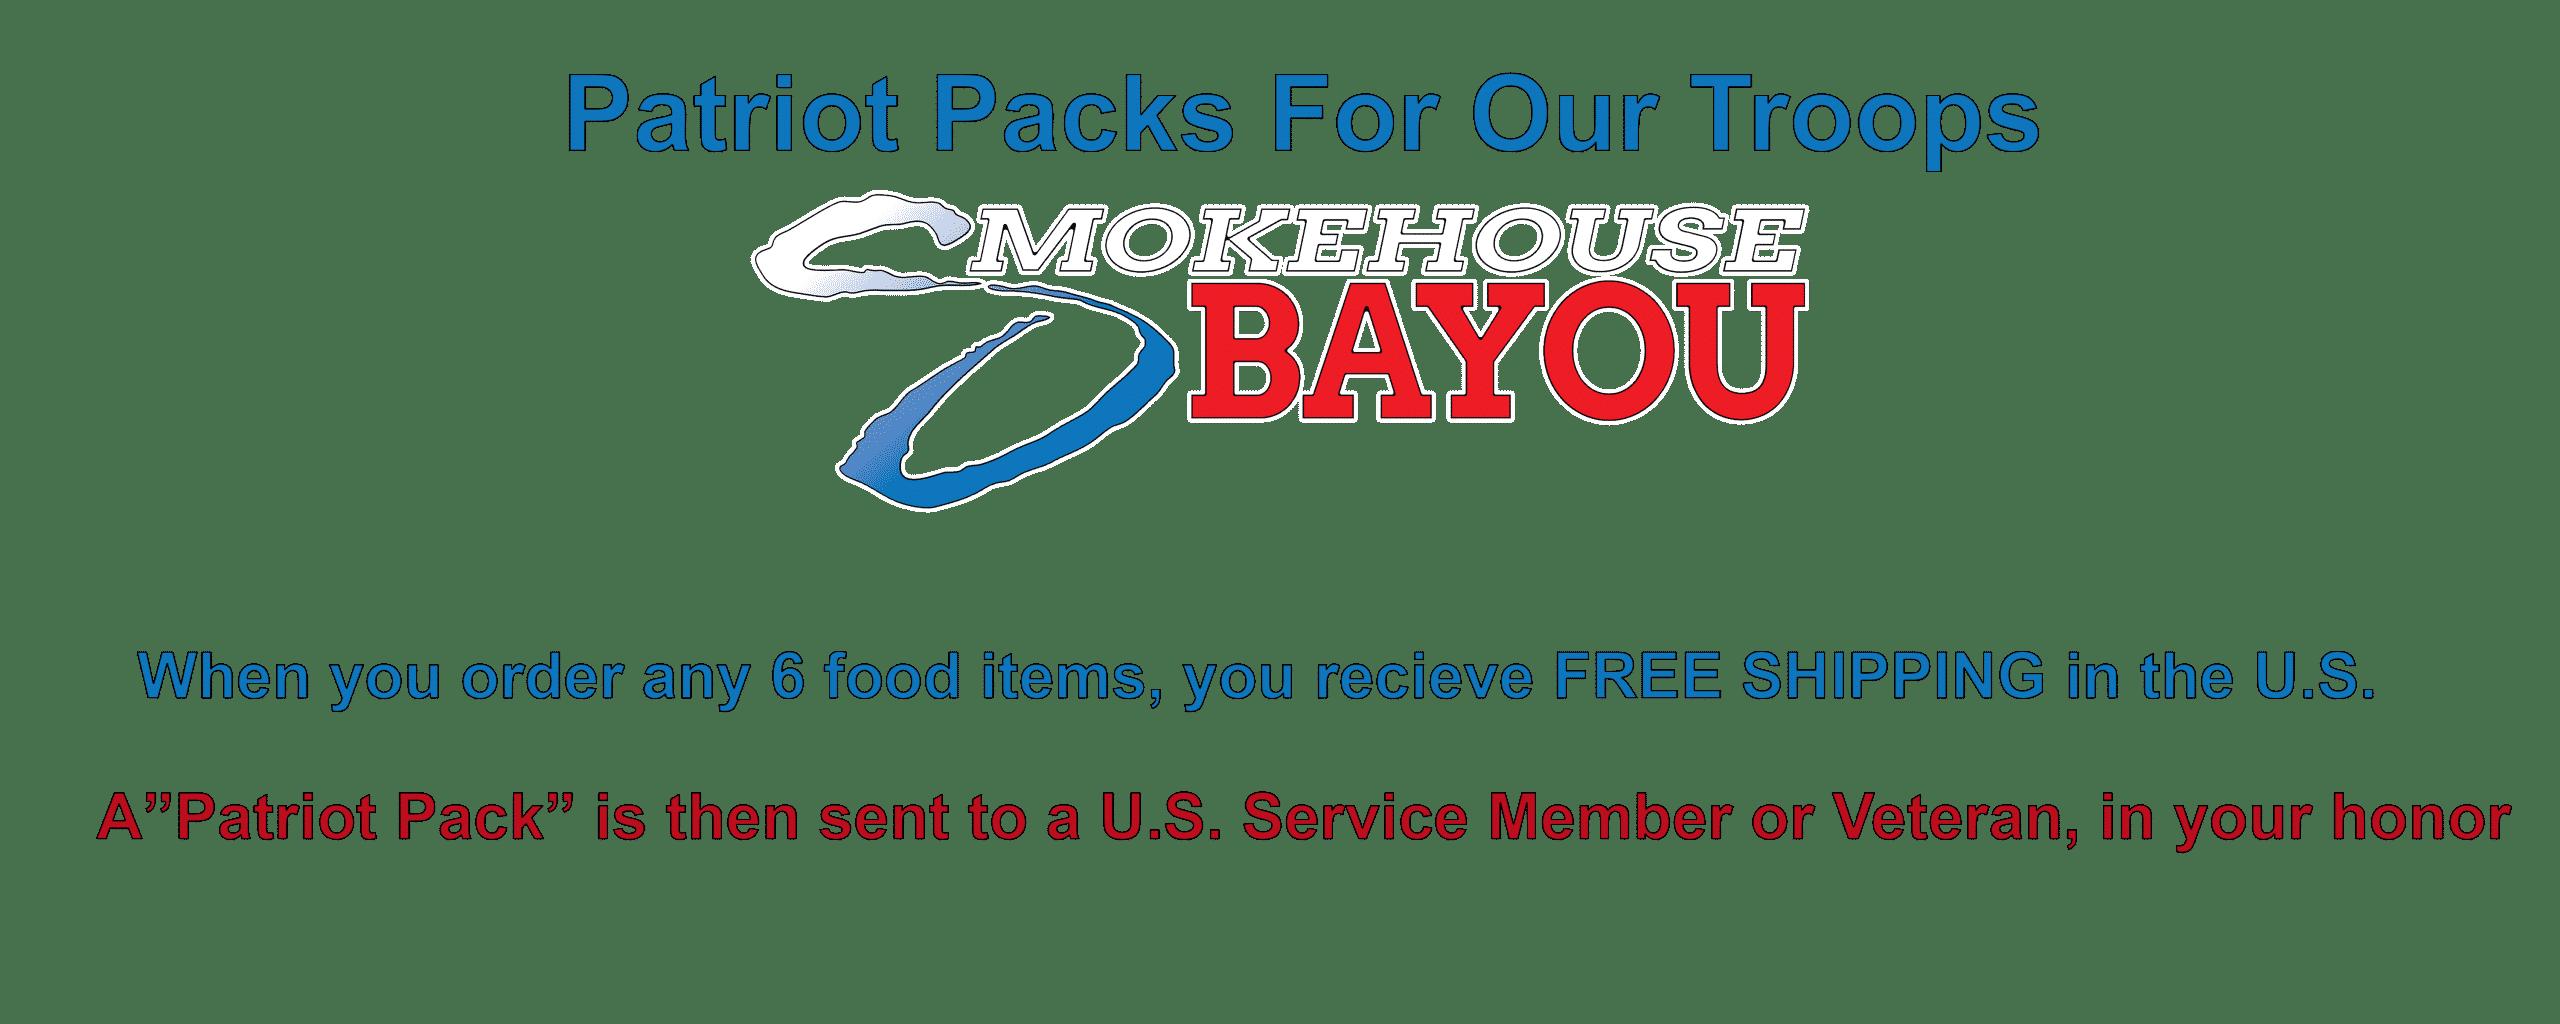 Patriot pack banner